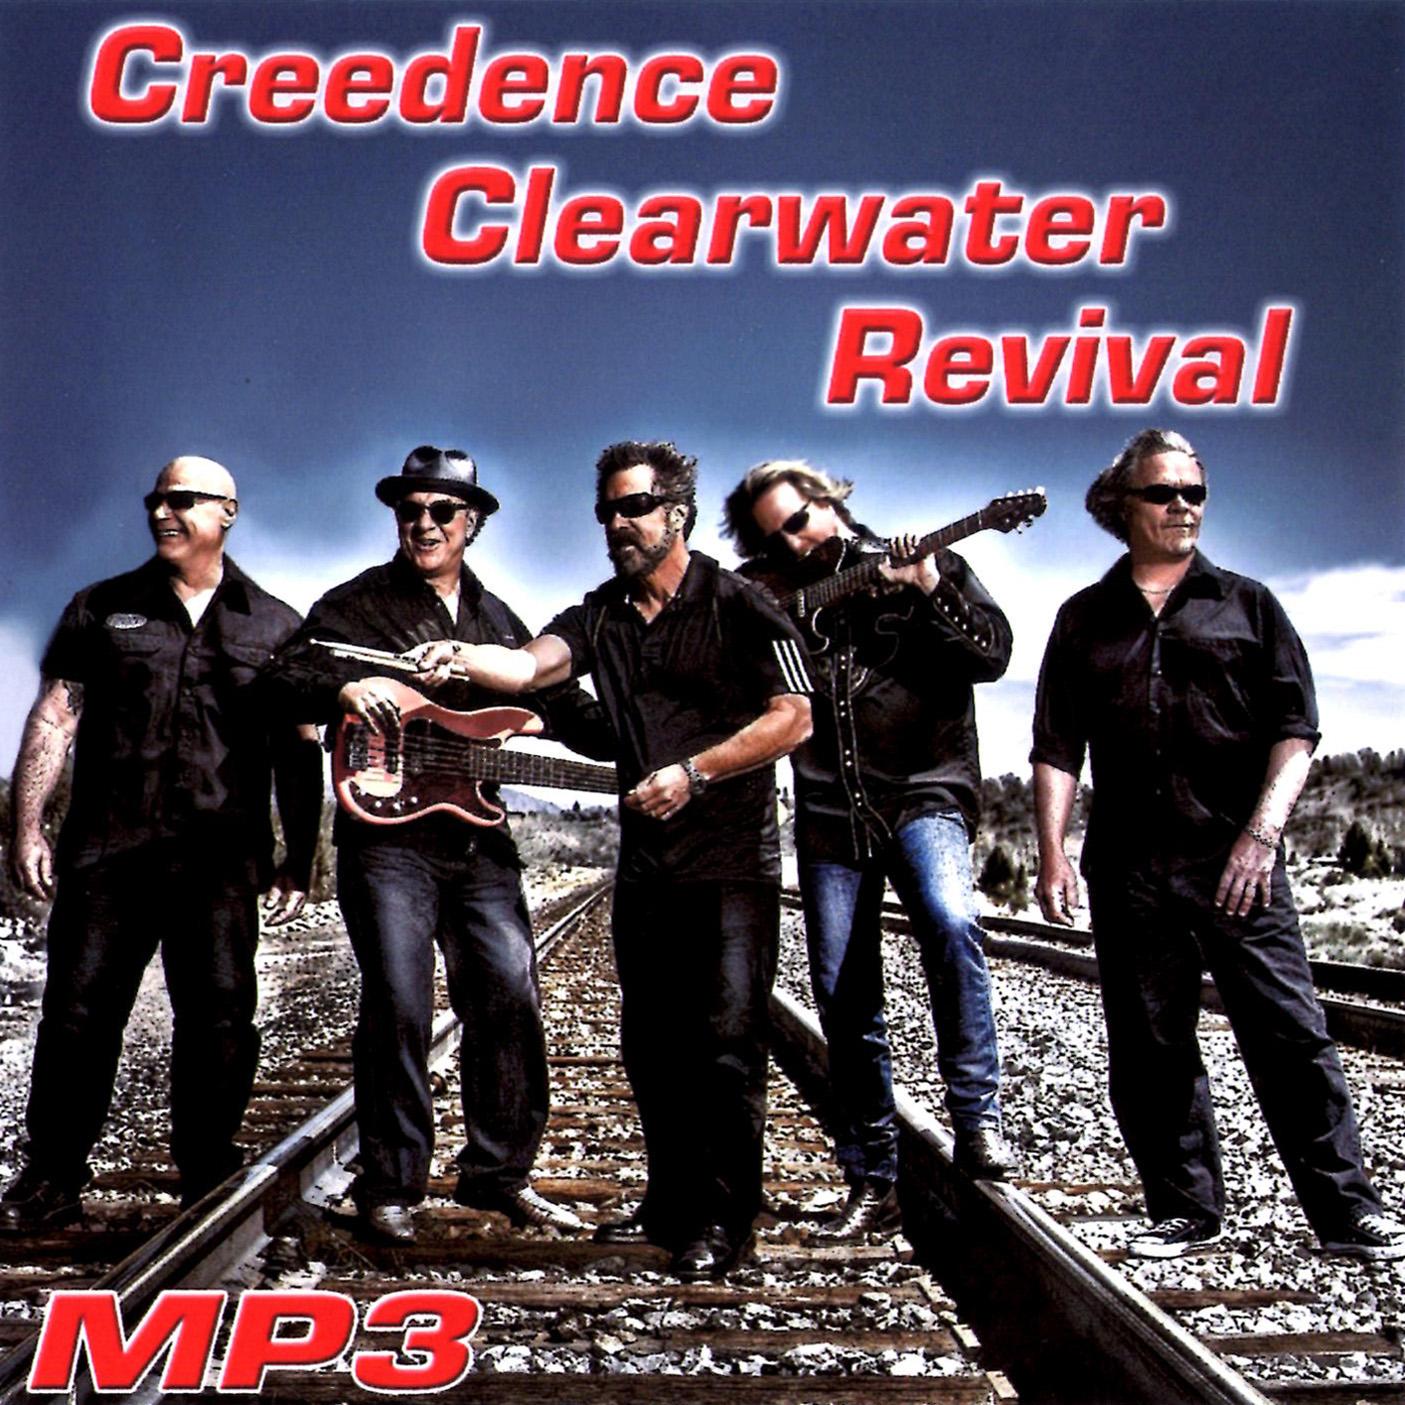 Creedence [mp3]